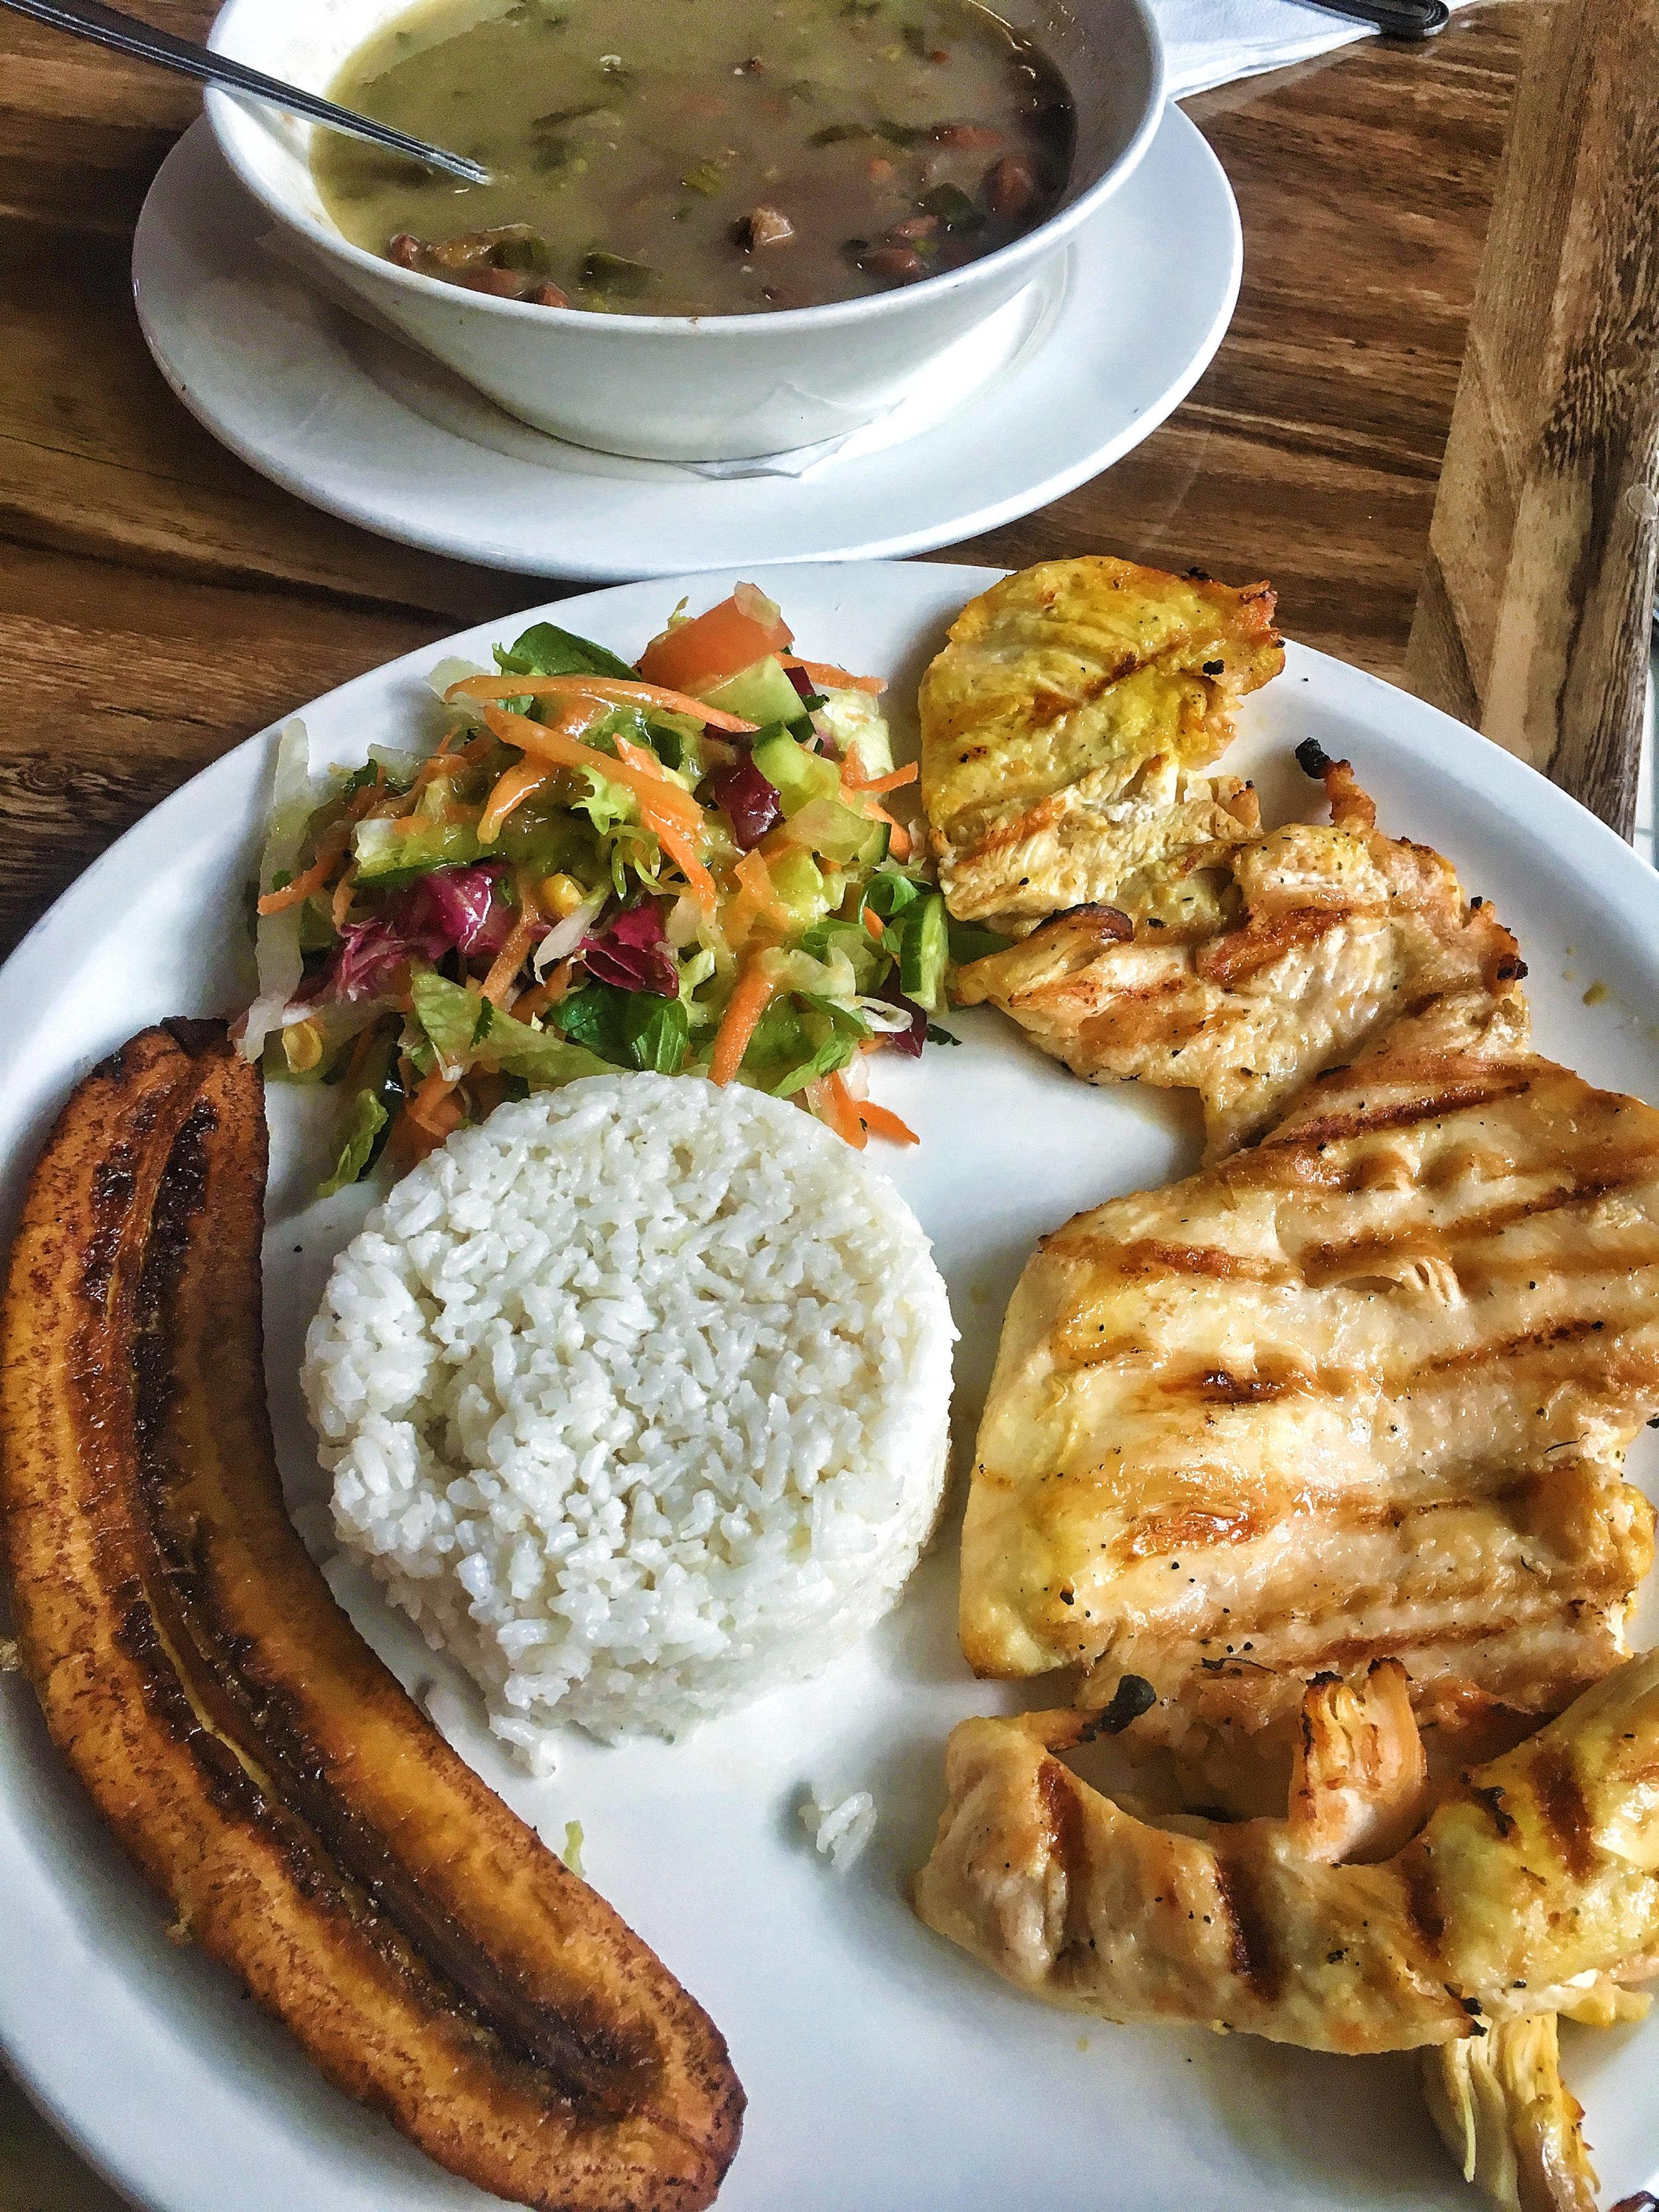 SOUP PLUS MEAT MAIN WITH SIDES | LEÑOS & CARBÓN | £8